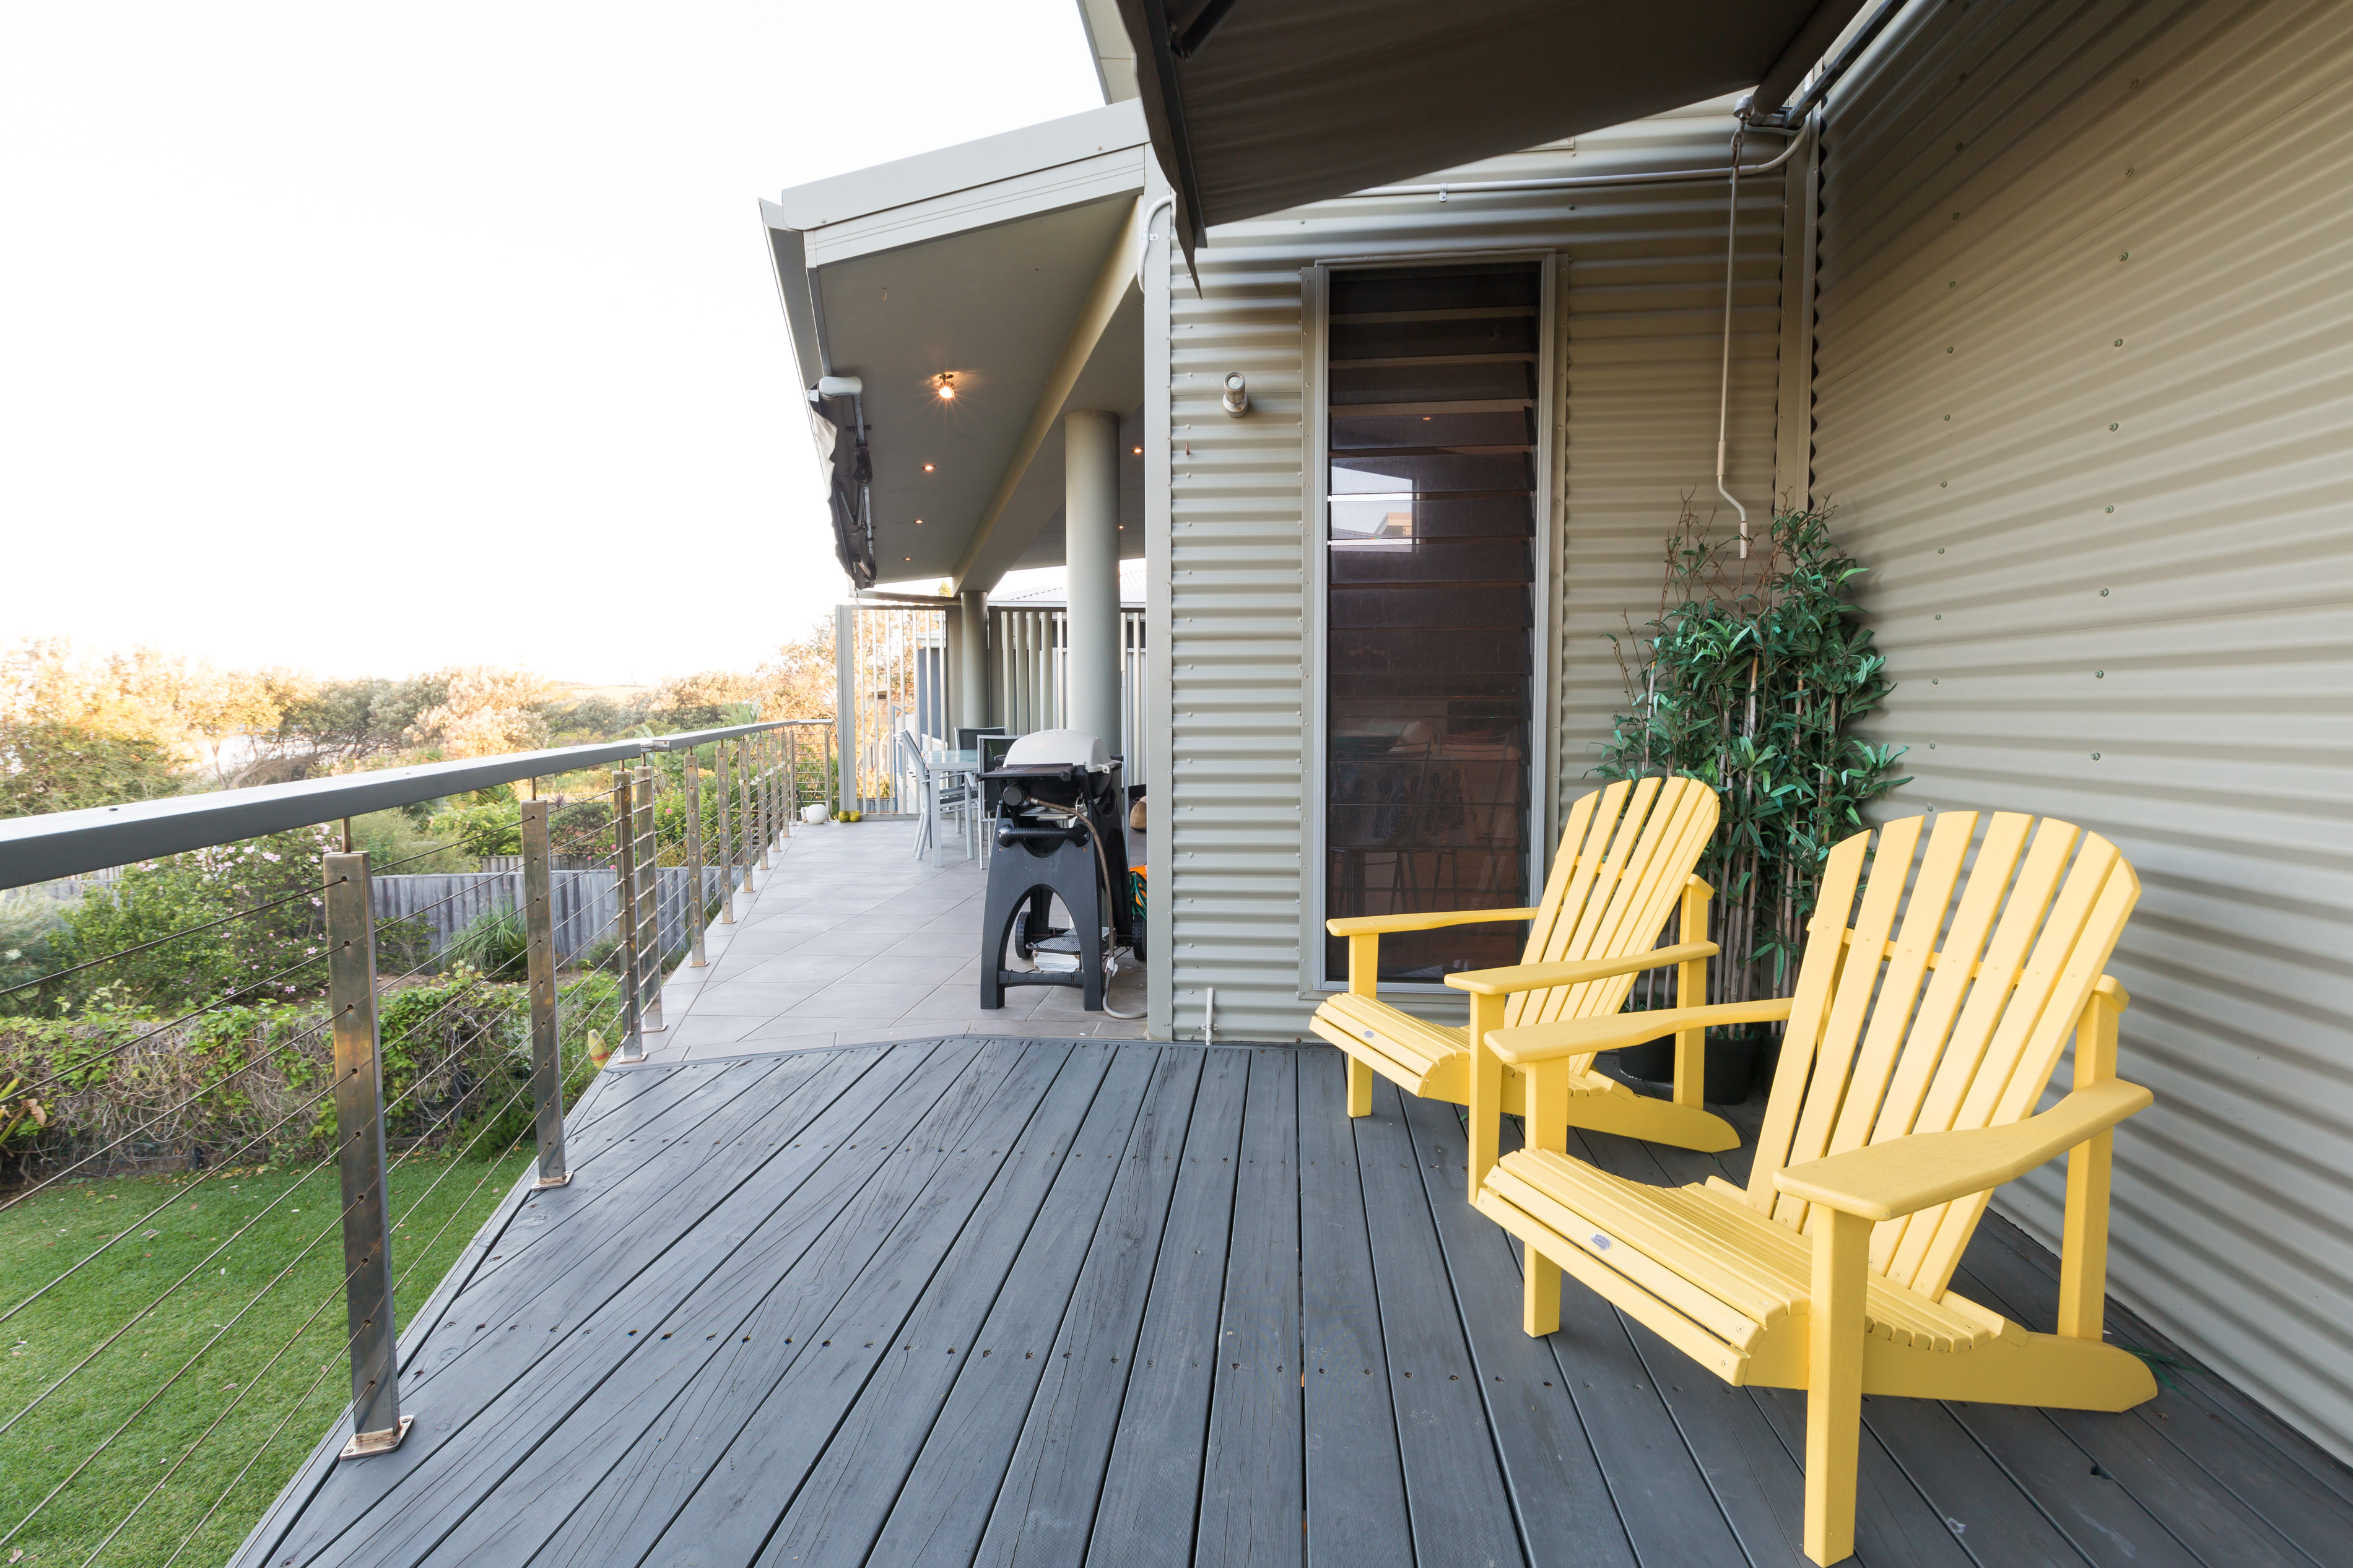 Black Diamond Beach House Expansive Deck, Real Estate Photography